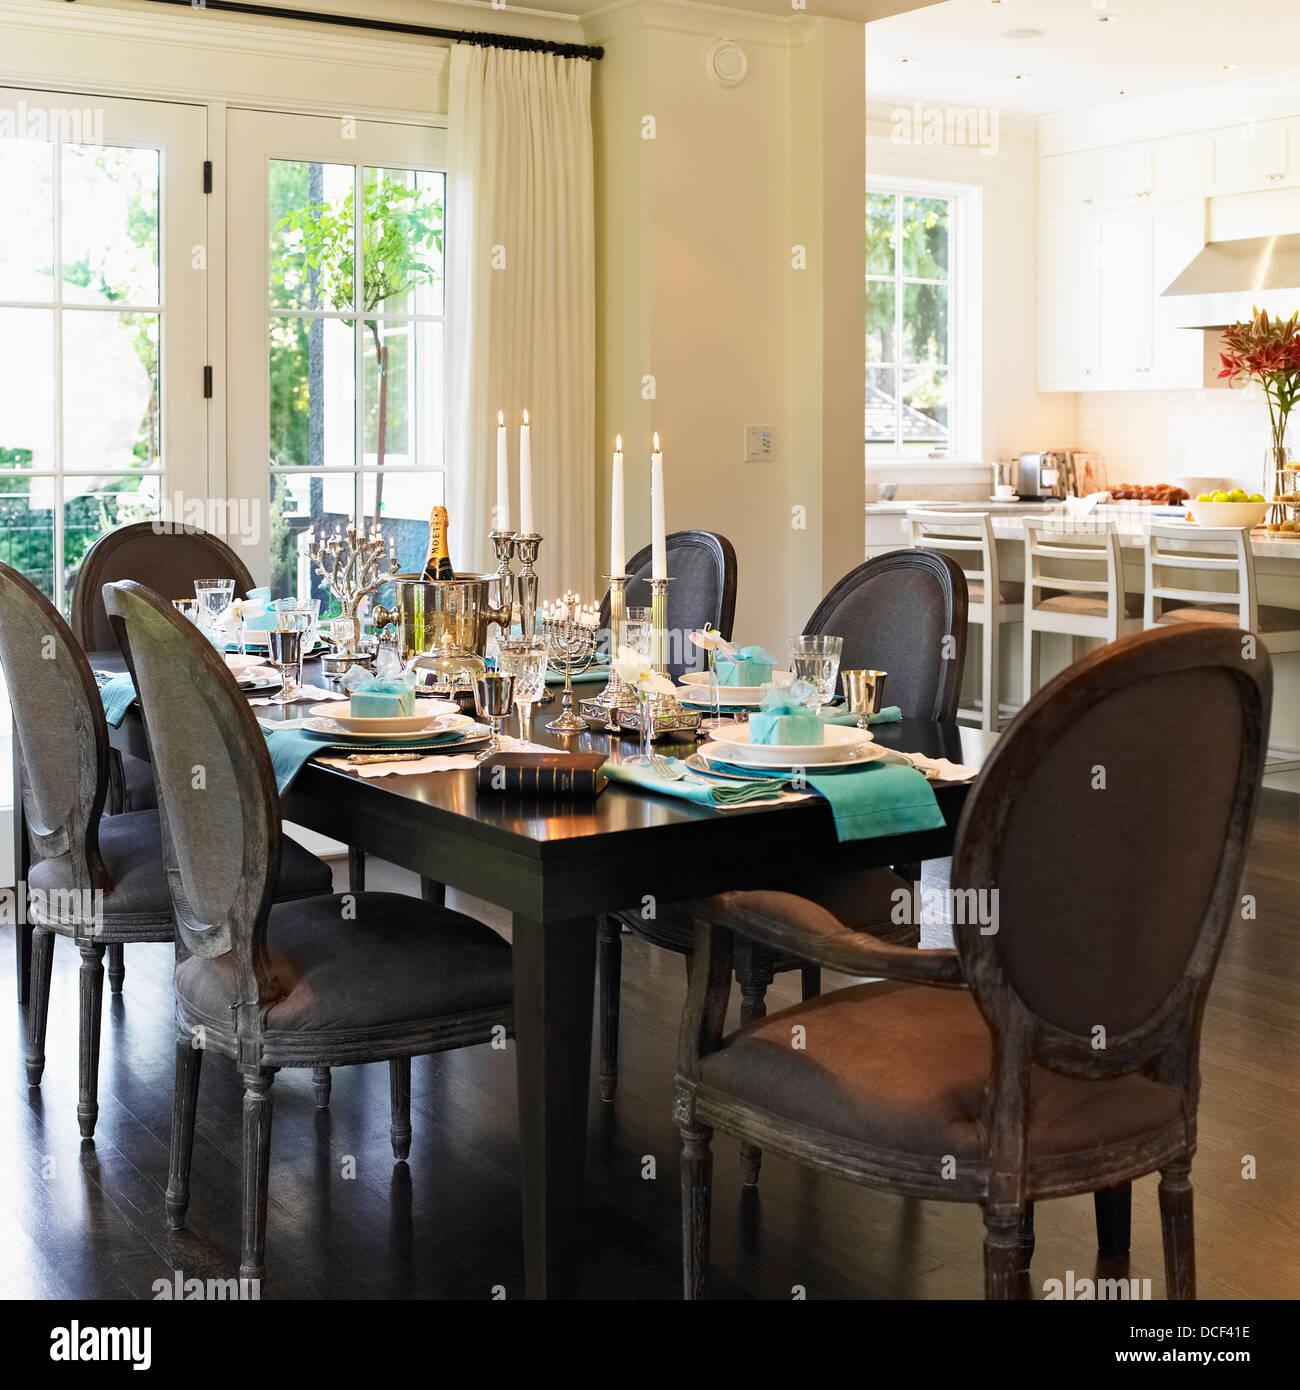 Dining Table Set For Hanukkah CelebrationVictoria Vancouver Island British Columbia Canada